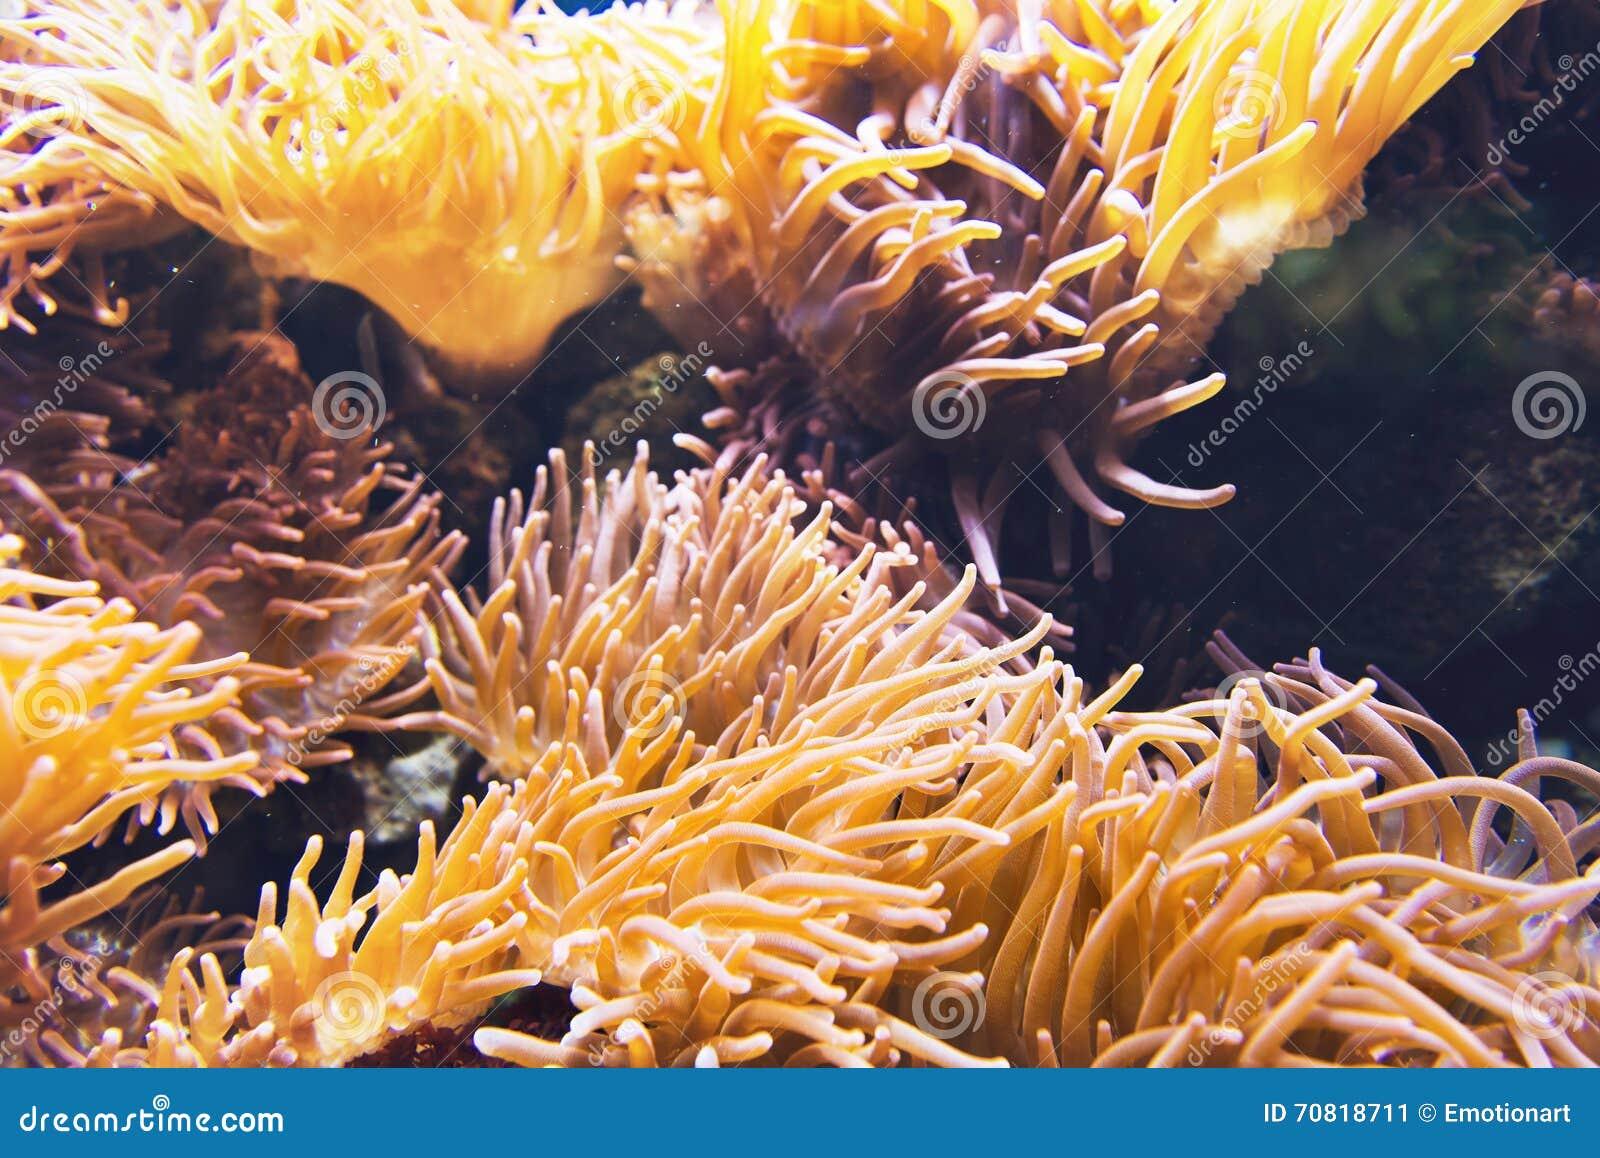 Large Yellow Sea Anemone Under Water Stock Image - Image